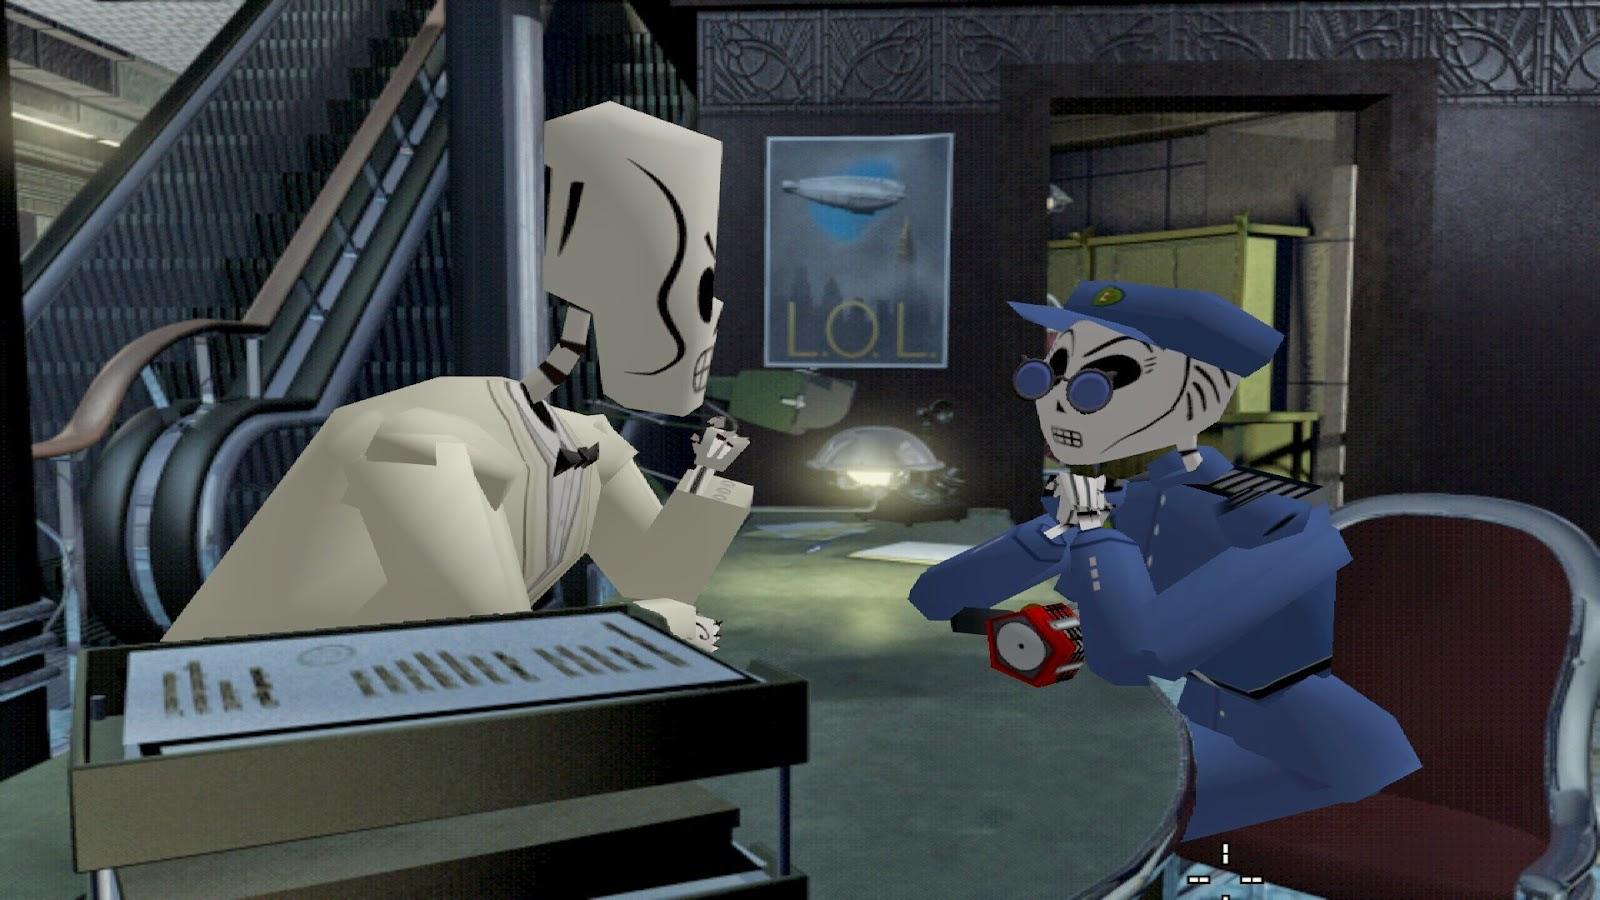 Grim Fandango Remastered security guard